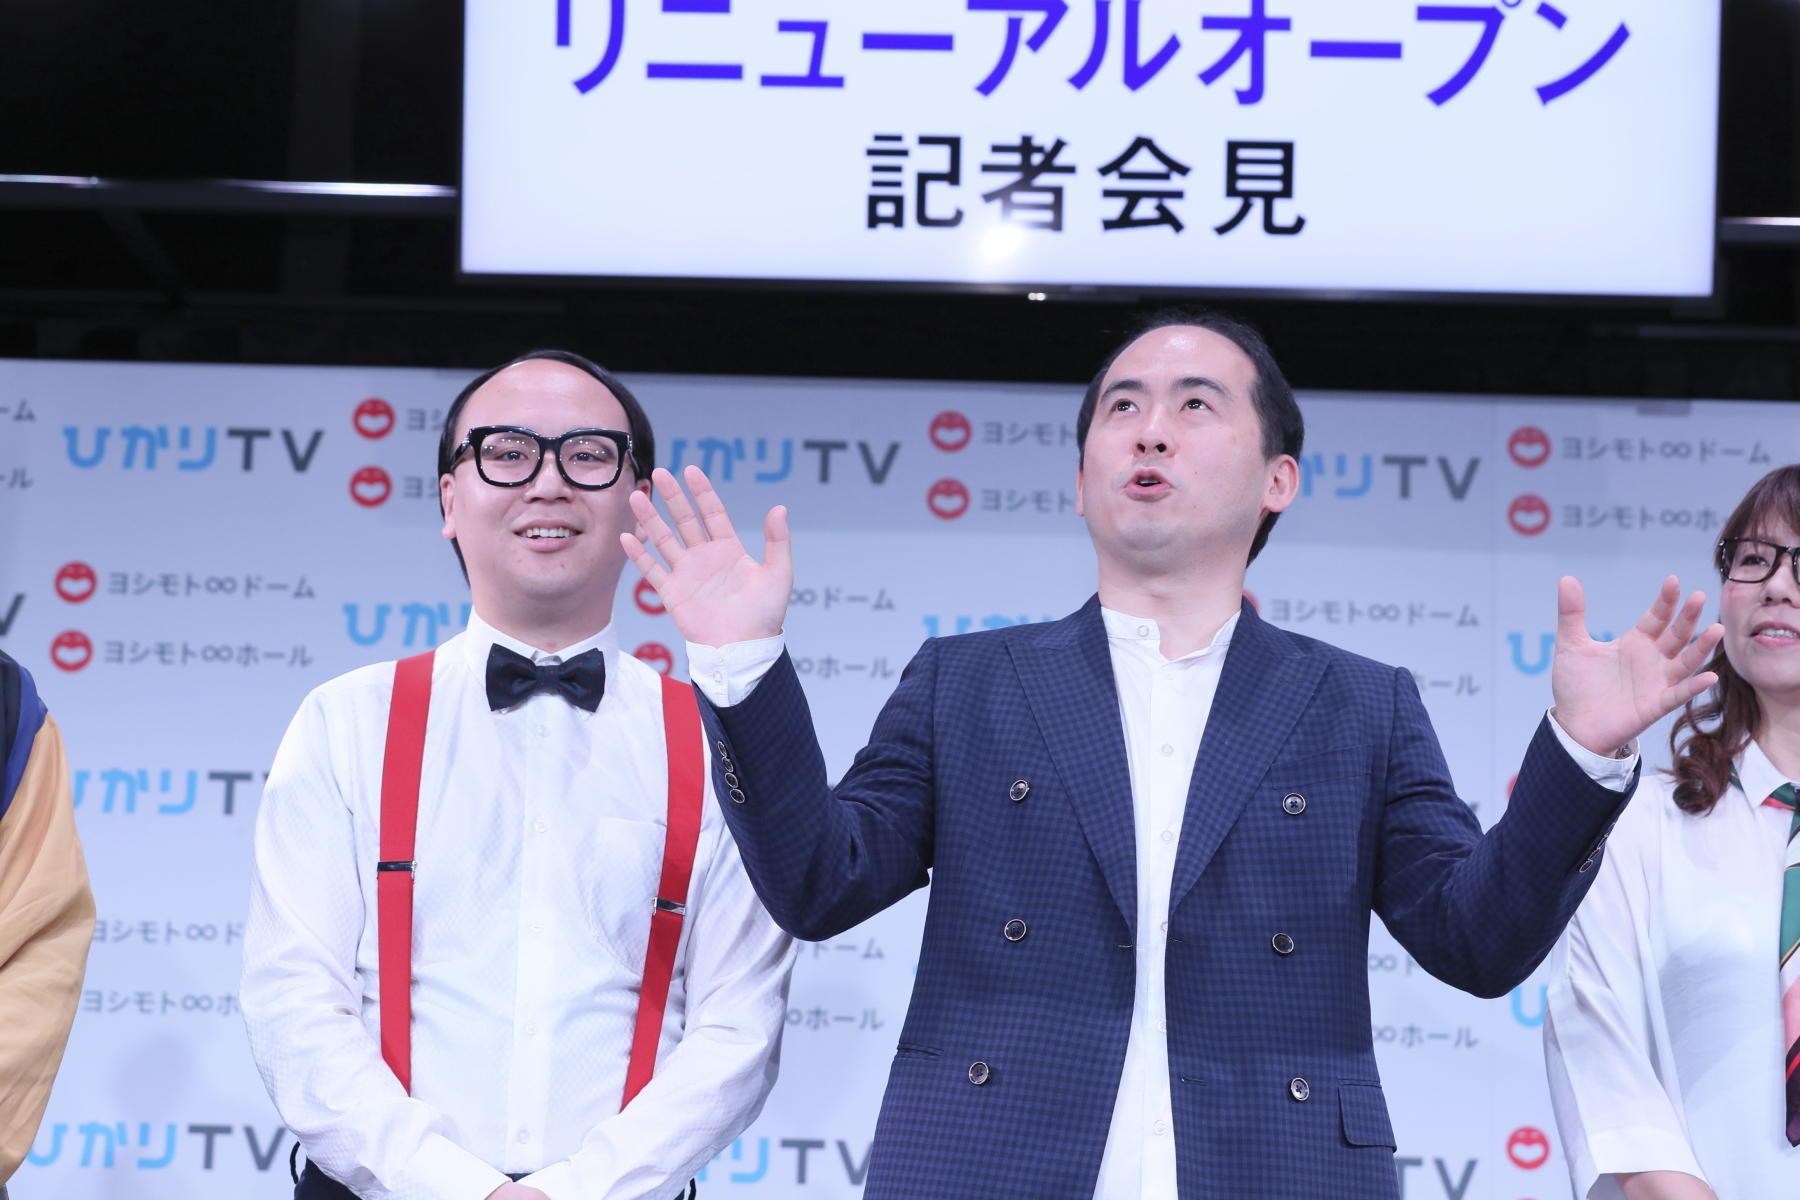 http://news.yoshimoto.co.jp/20181110145423-866e5a0483c7e2adc2b45acefe9a3355c40f622d.jpg